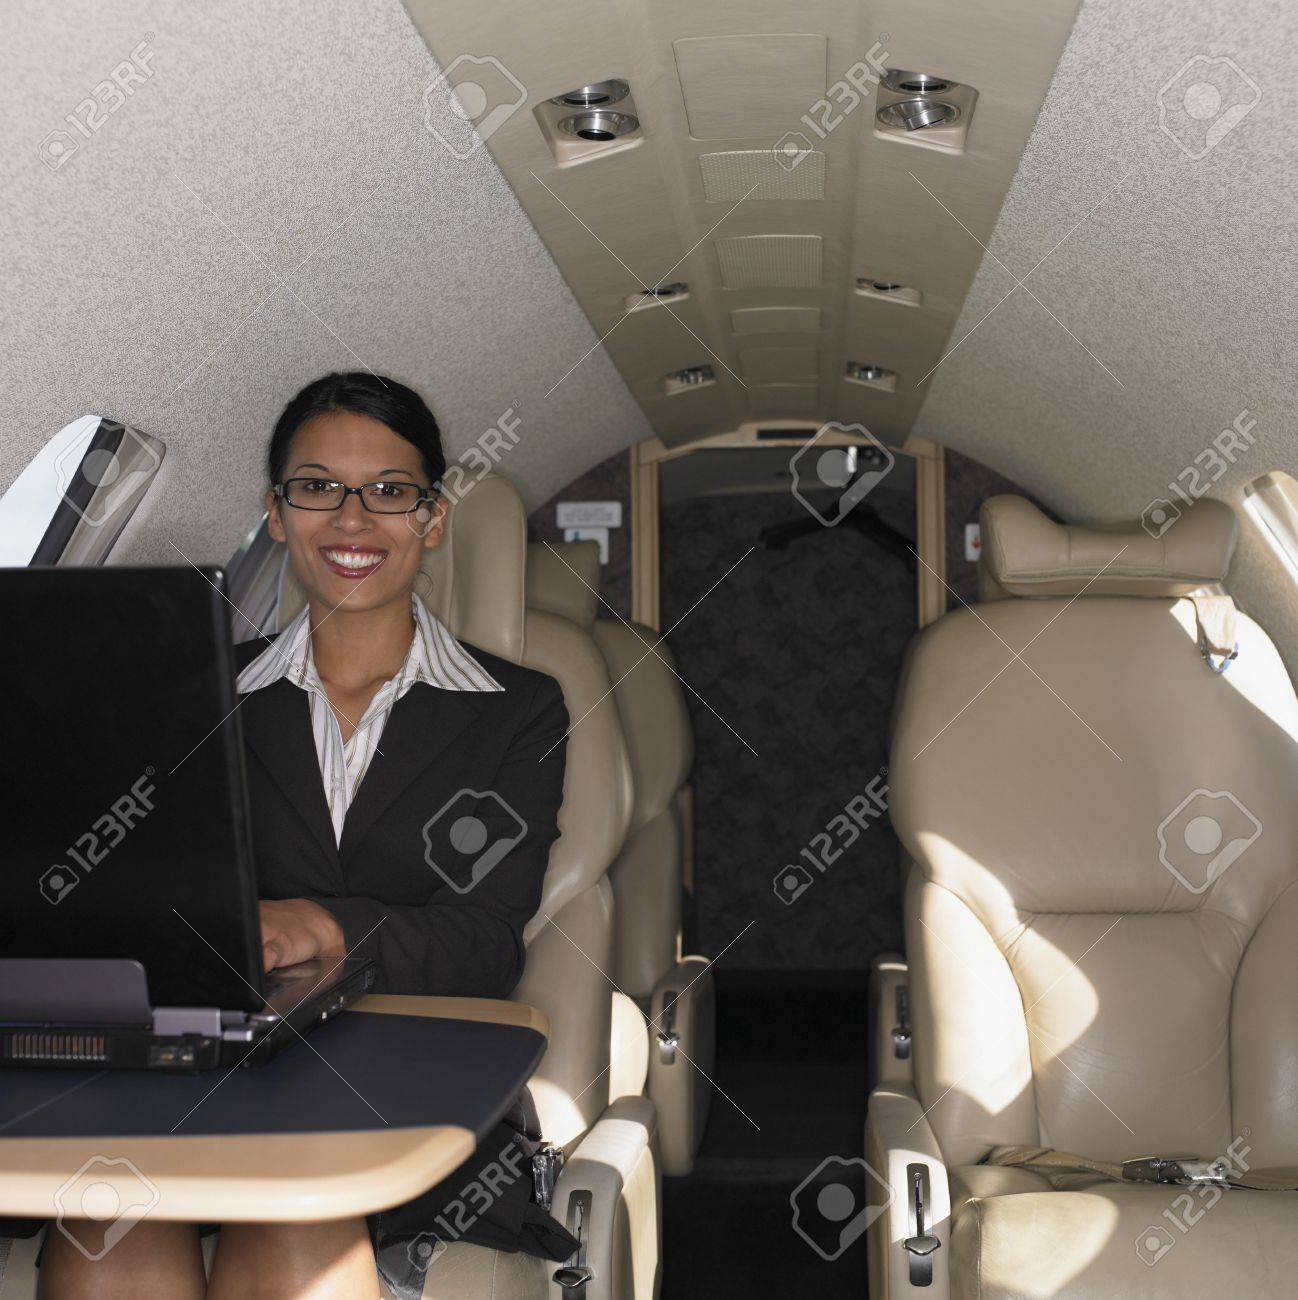 Businesswoman working on laptop inside airplane, Perth, Australia Stock Photo - 16090334